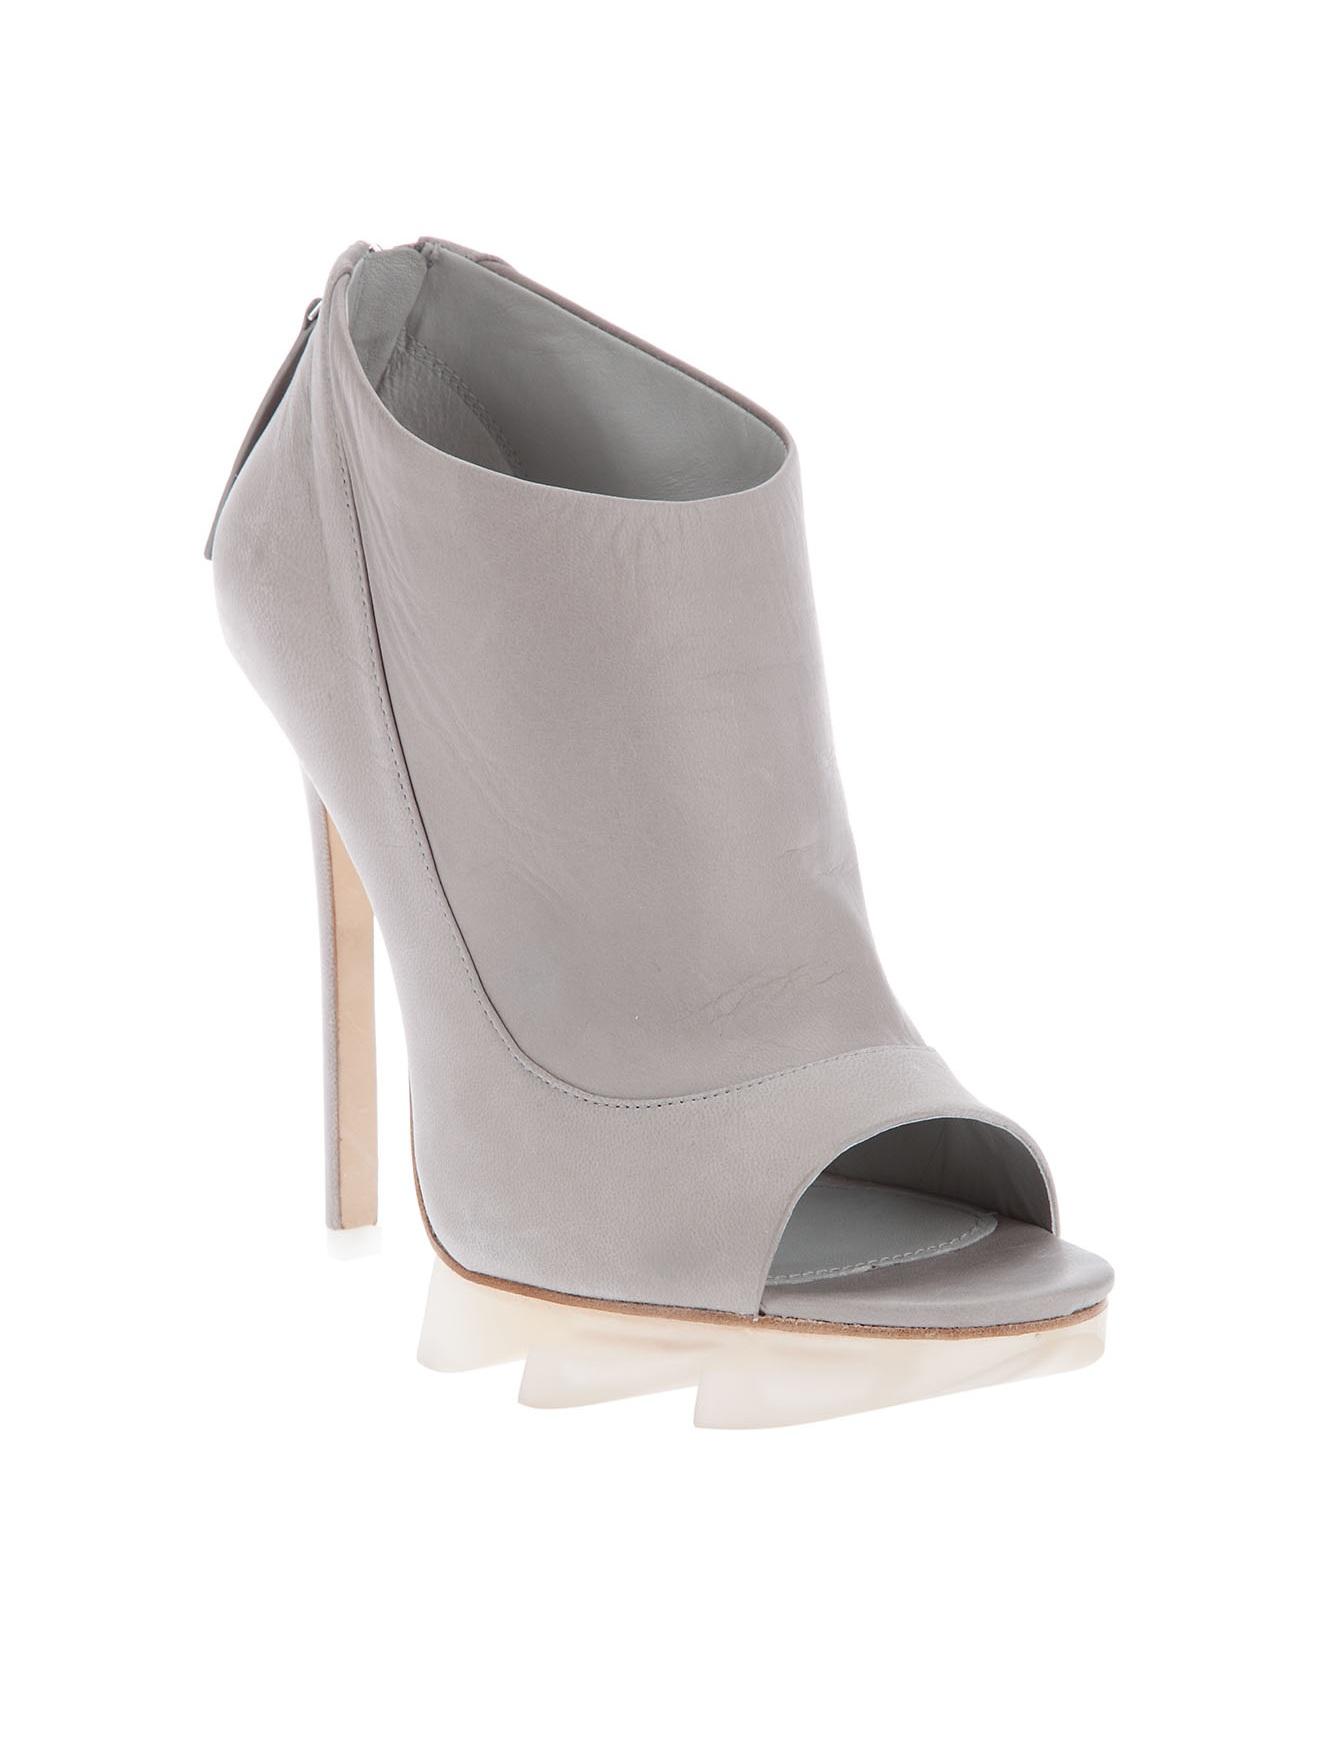 camilla skovgaard peep toe shoe boot in gray lyst